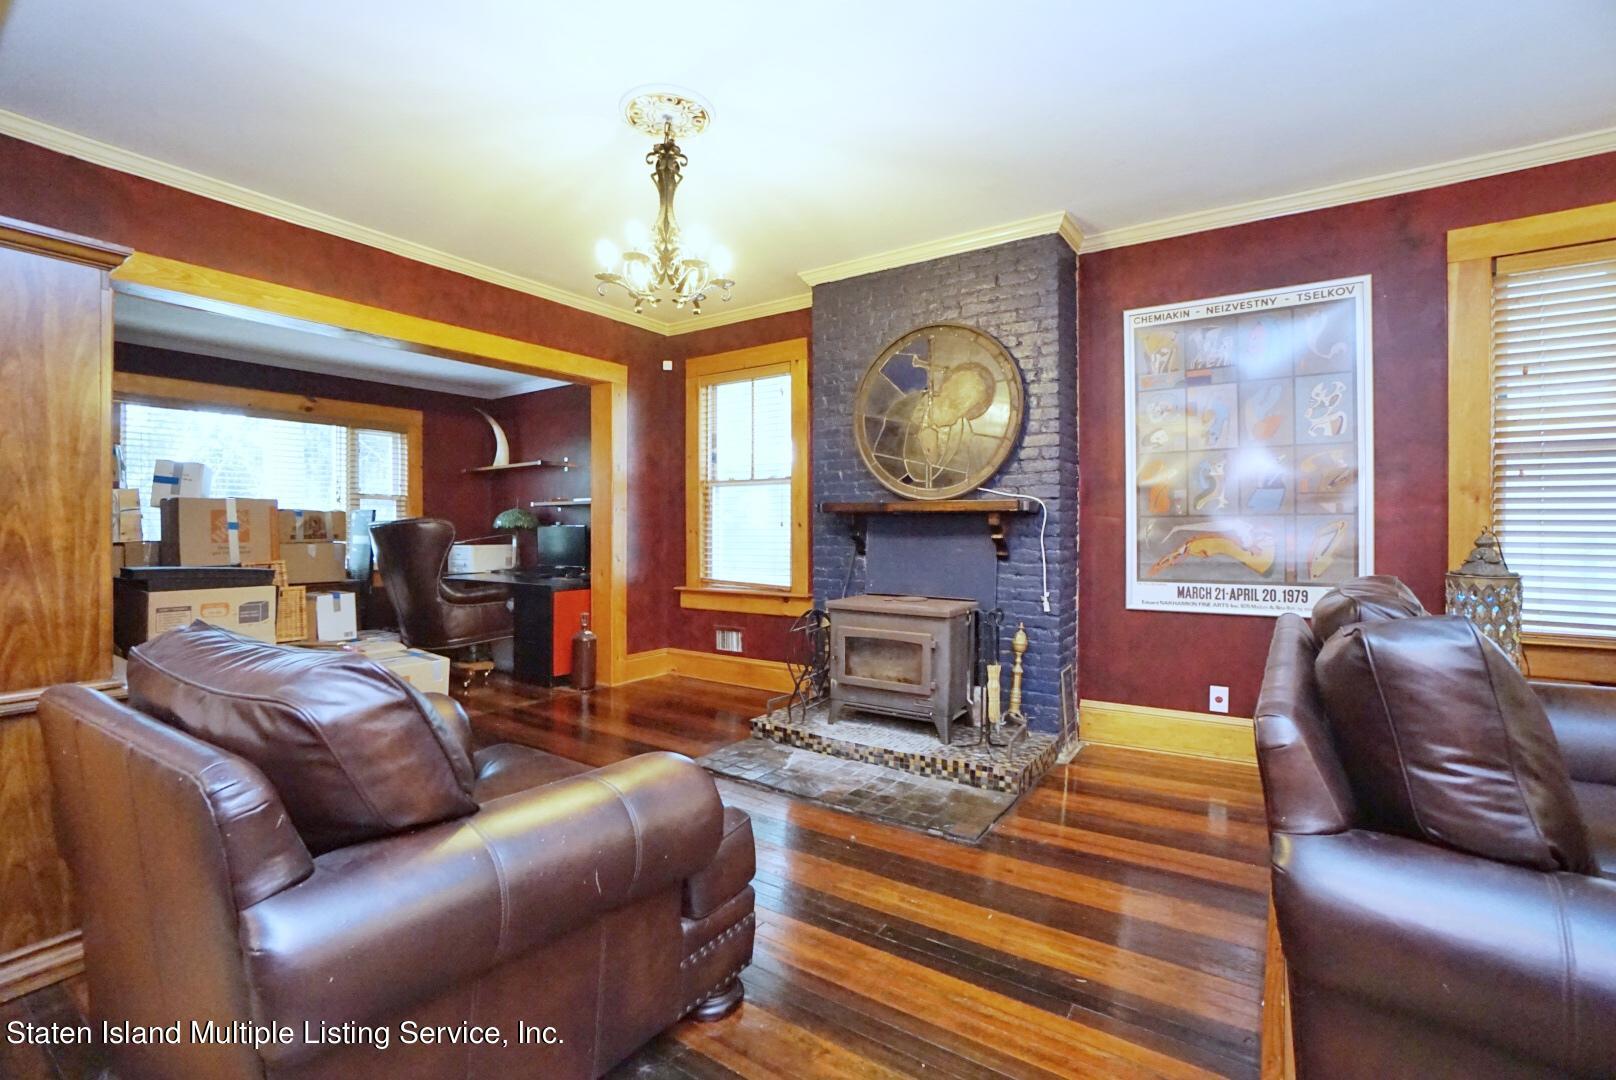 Single Family - Detached 136 York Avenue  Staten Island, NY 10301, MLS-1147575-6